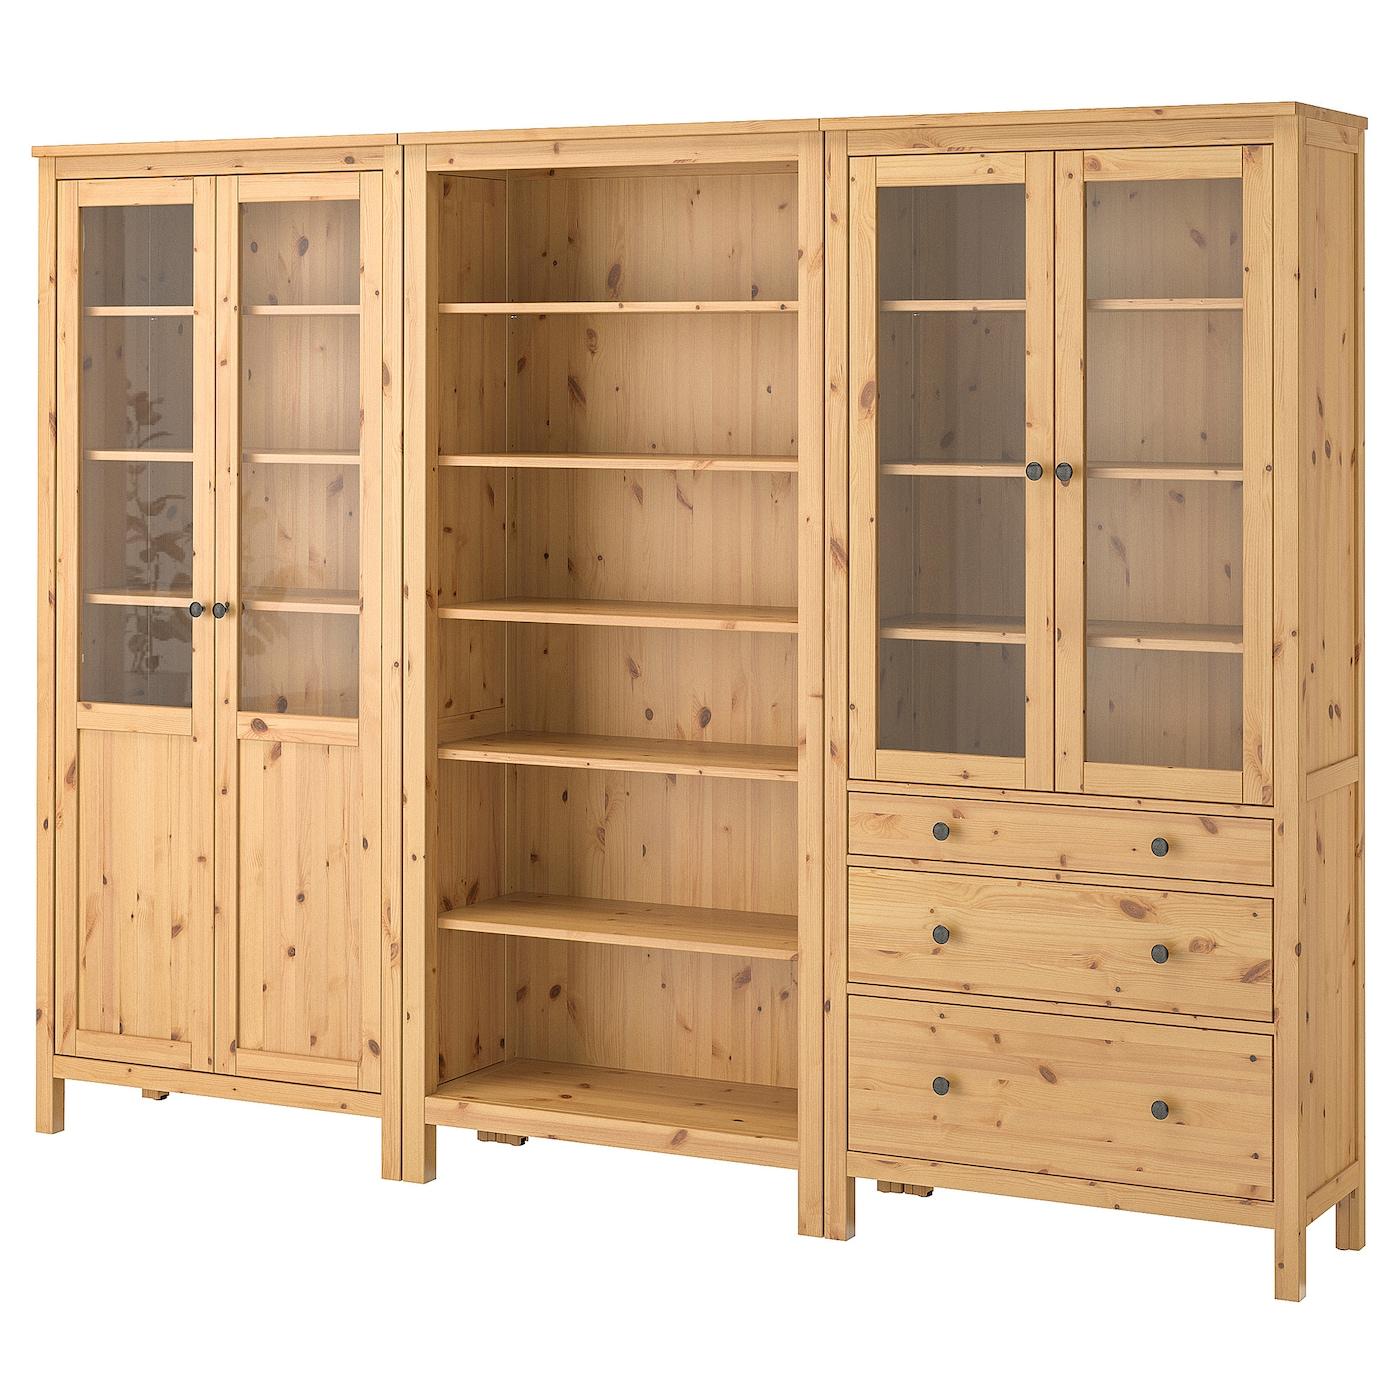 Hemnes mueble de sal n con almacenaje marr n claro vidrio 270 x 197 cm ikea - Muebles para almacenaje ...